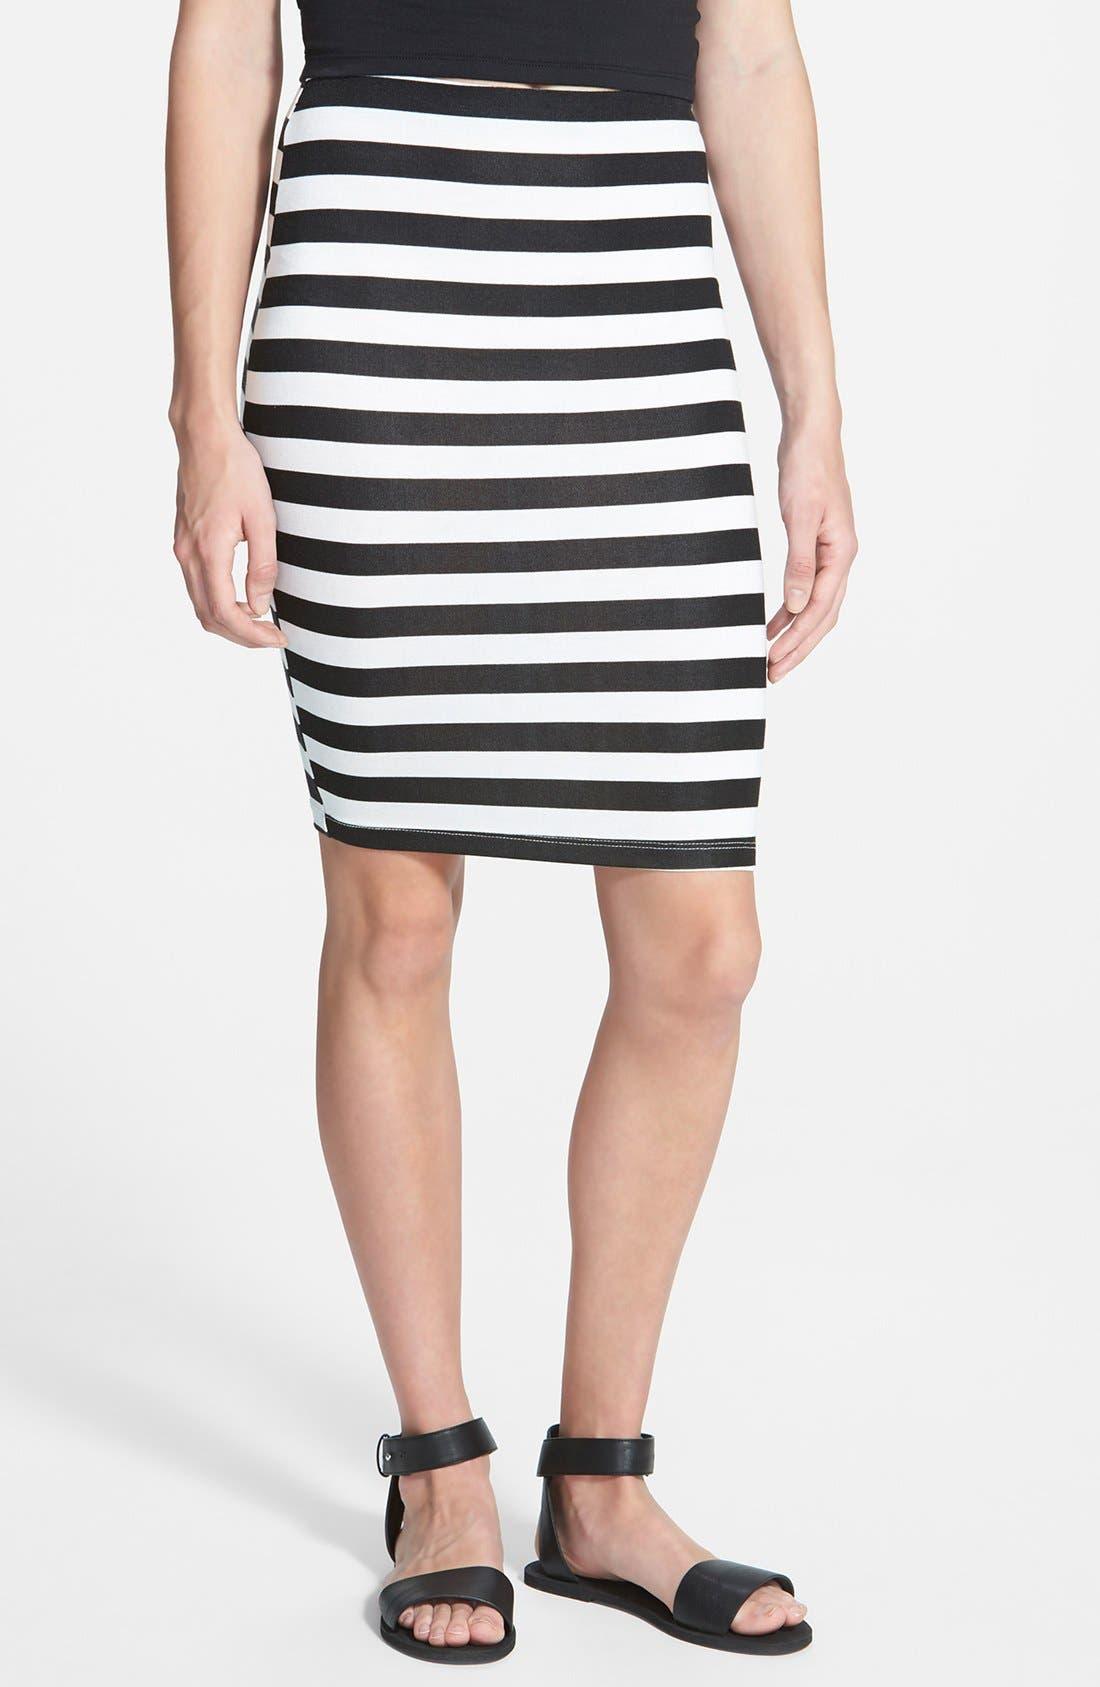 Alternate Image 1 Selected - Lush Stripe Bandage Skirt